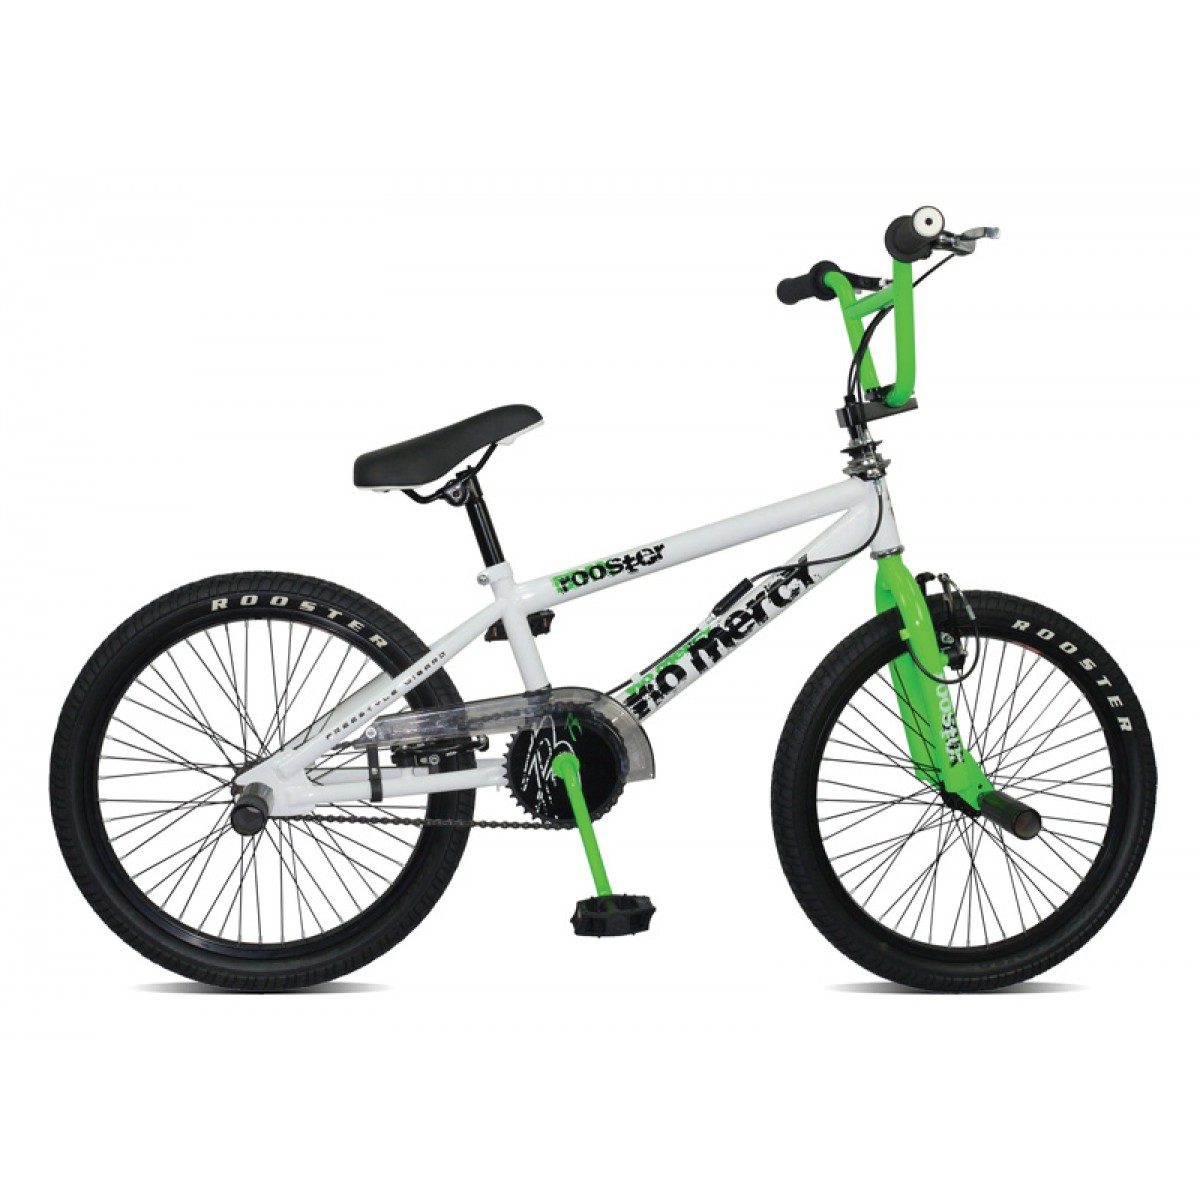 rooster no mercy 20 boys white green bmx bike. Black Bedroom Furniture Sets. Home Design Ideas